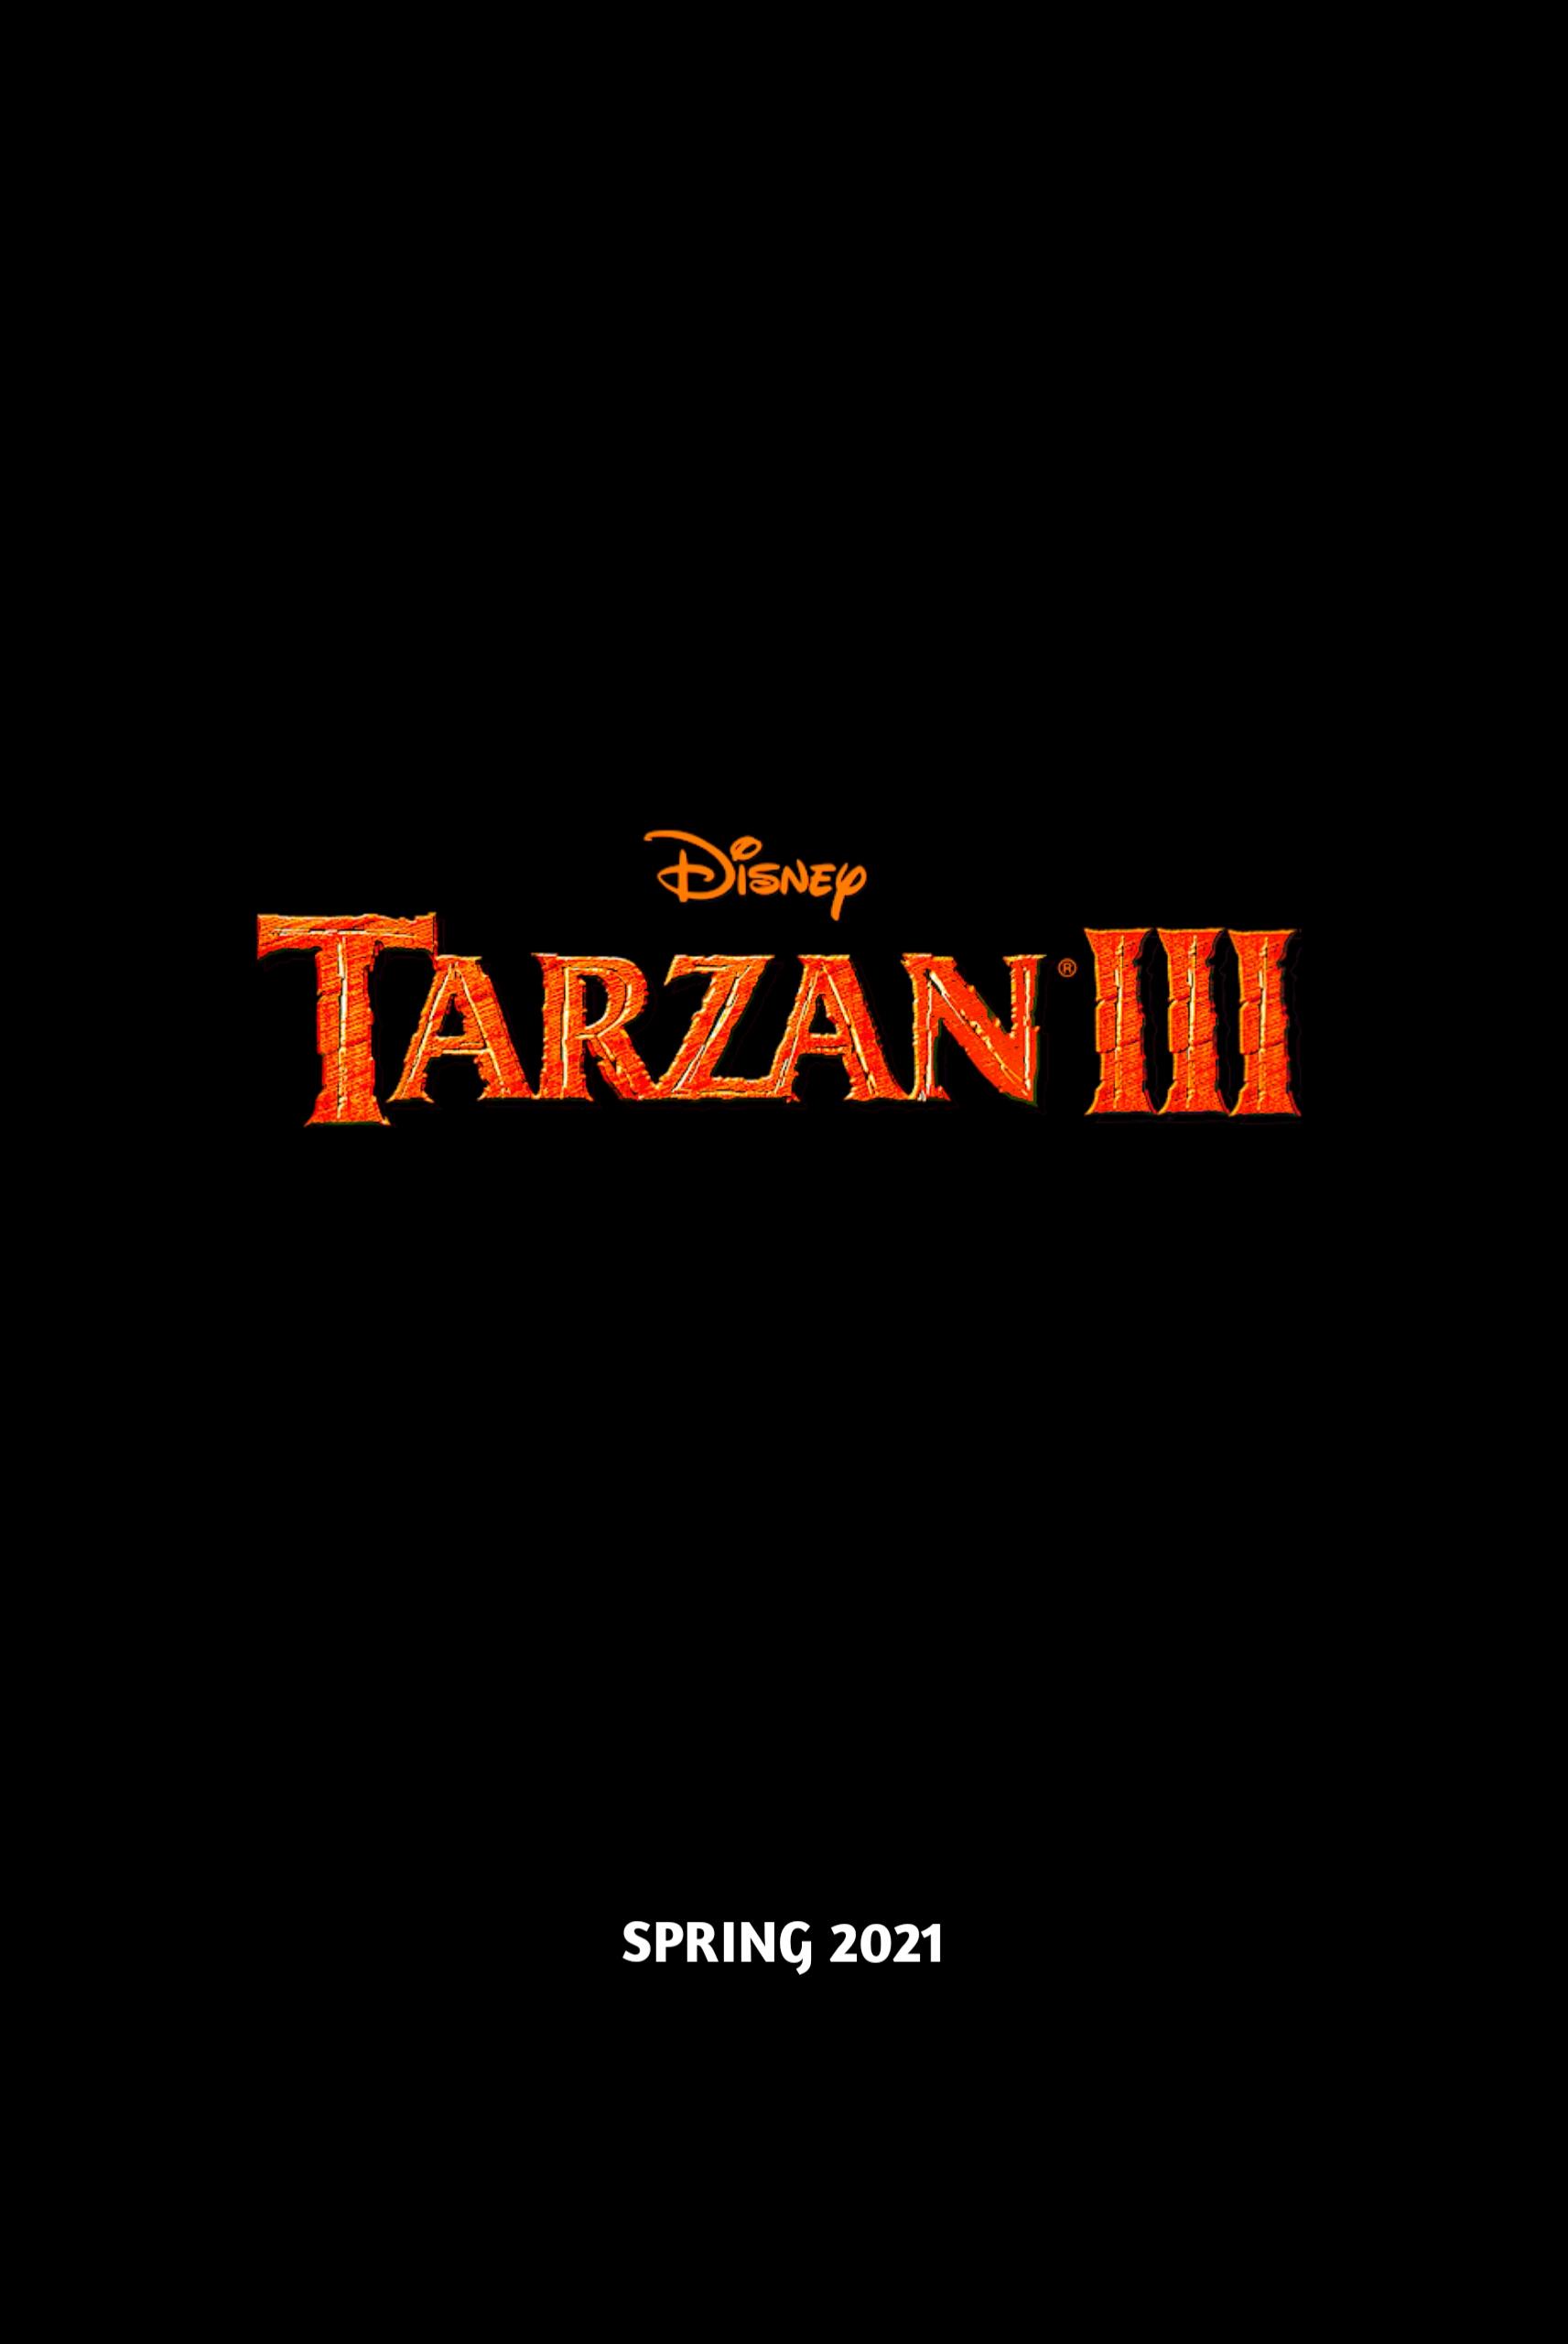 Tarzan Film 2021